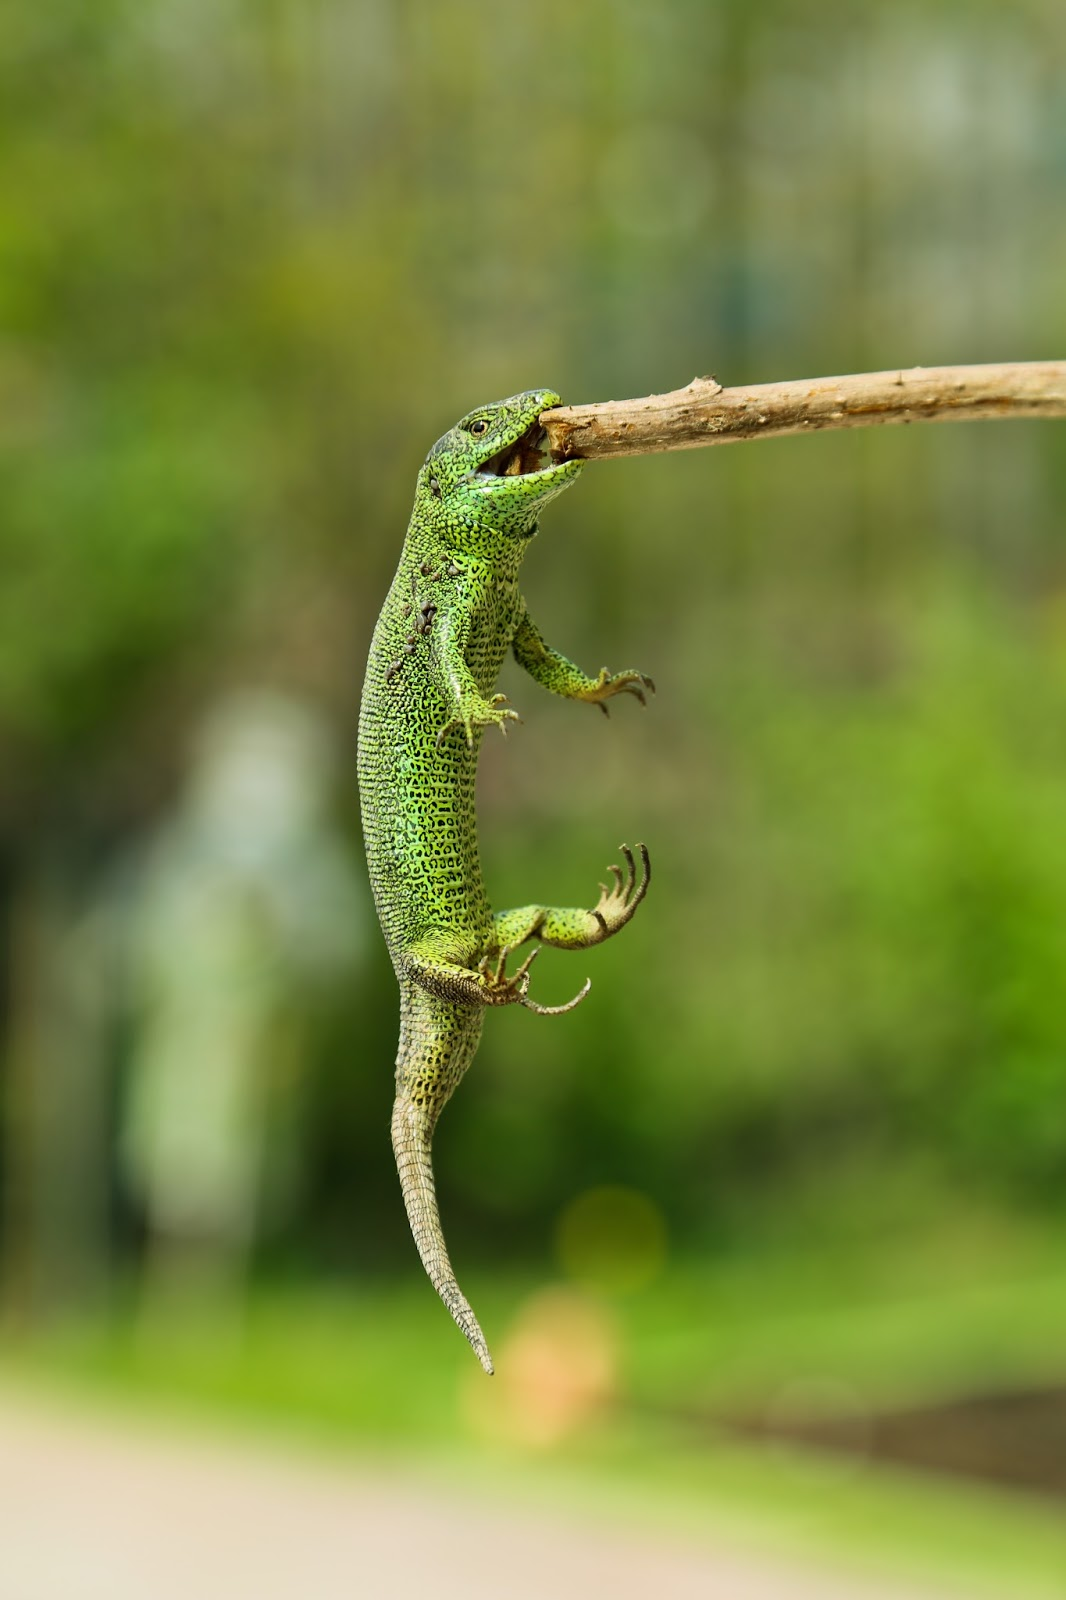 Amazing lizard hanging from stick.